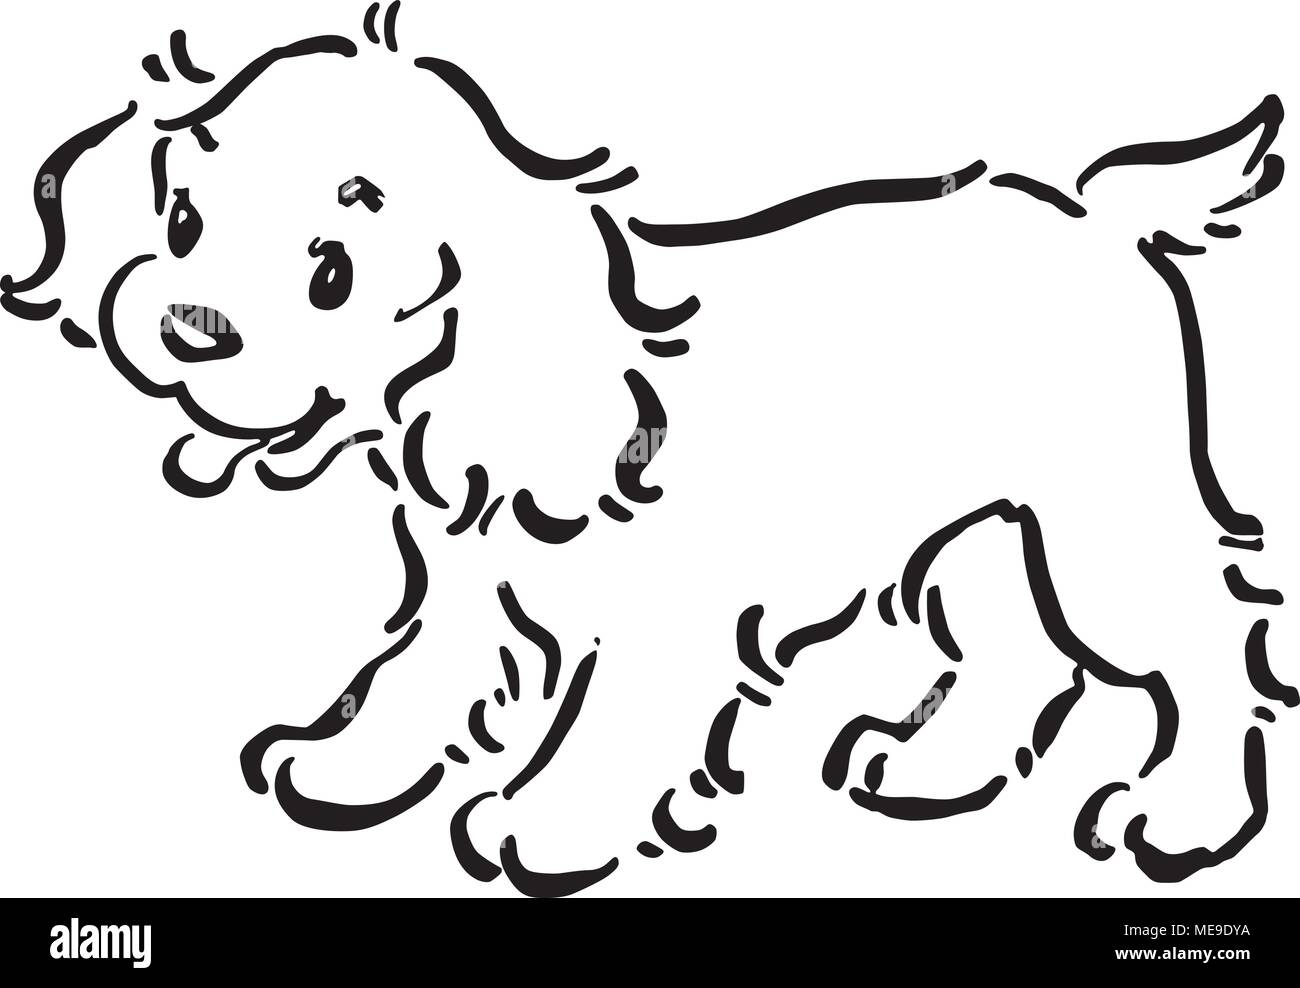 Cute Puppy Dog Retro Clipart Illustration Stock Vector Image Art Alamy